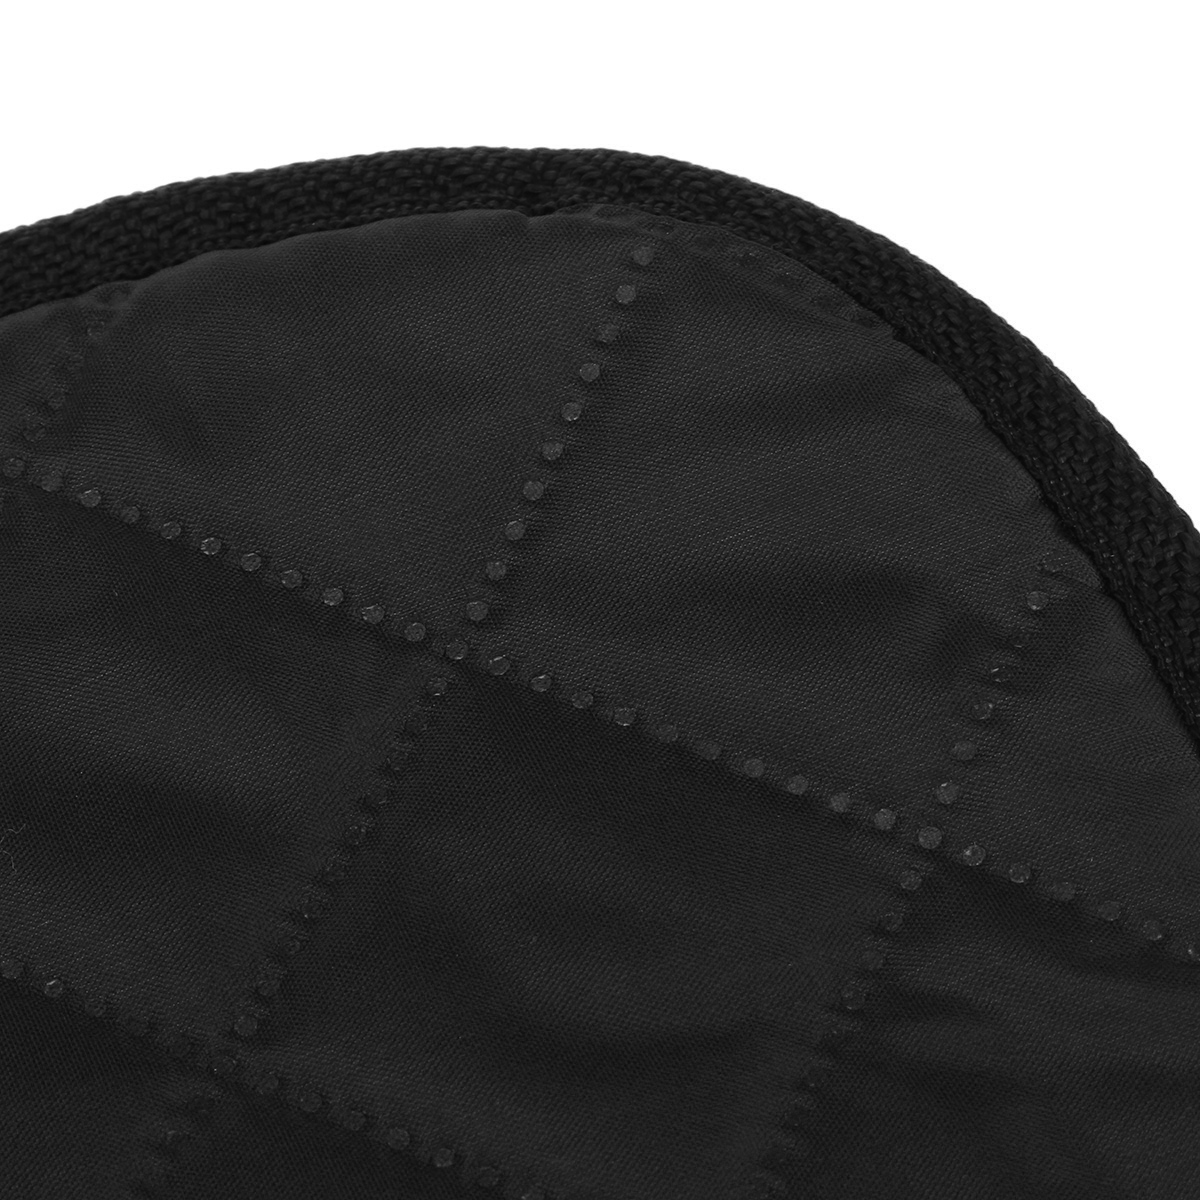 Universal DC 12V Universal Car Front Heating Seat Cover Cushion Warming Pad Kit